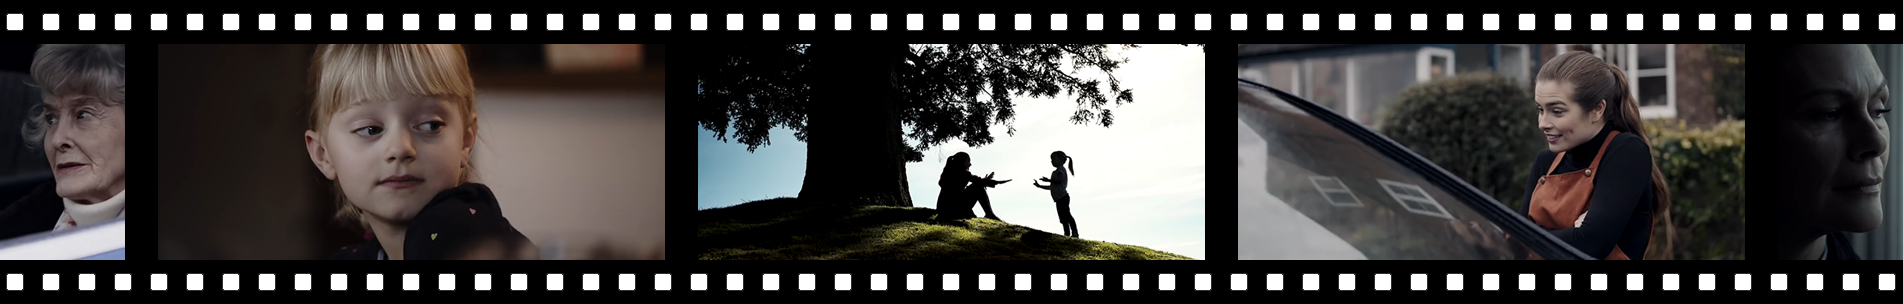 "Pellicule ""The Silent Child"""